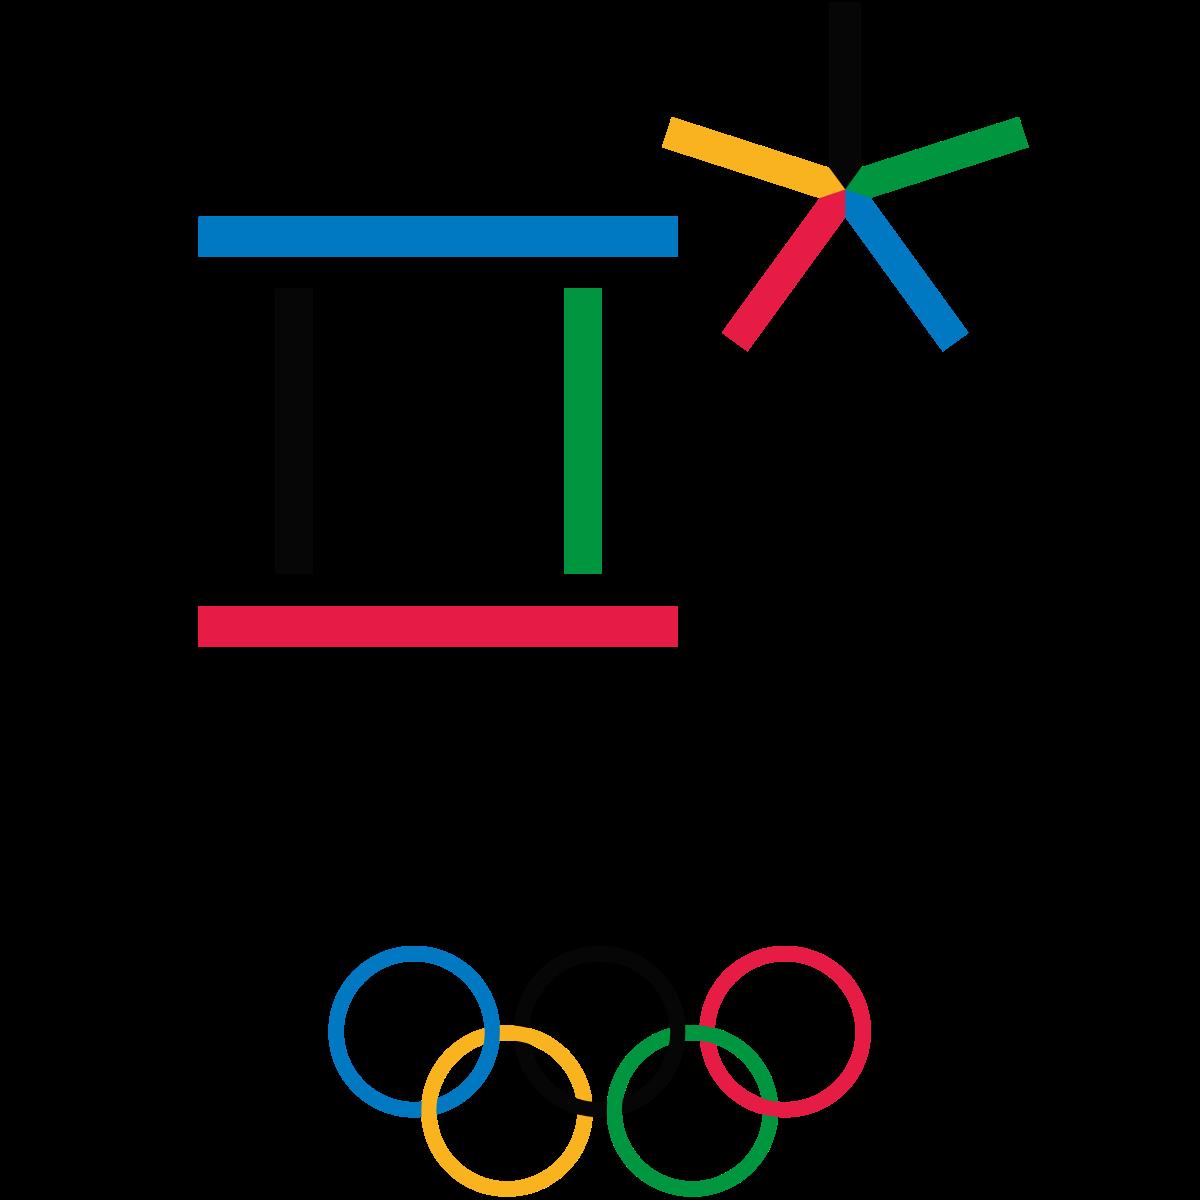 PyeongChang2018_WinterOlympics